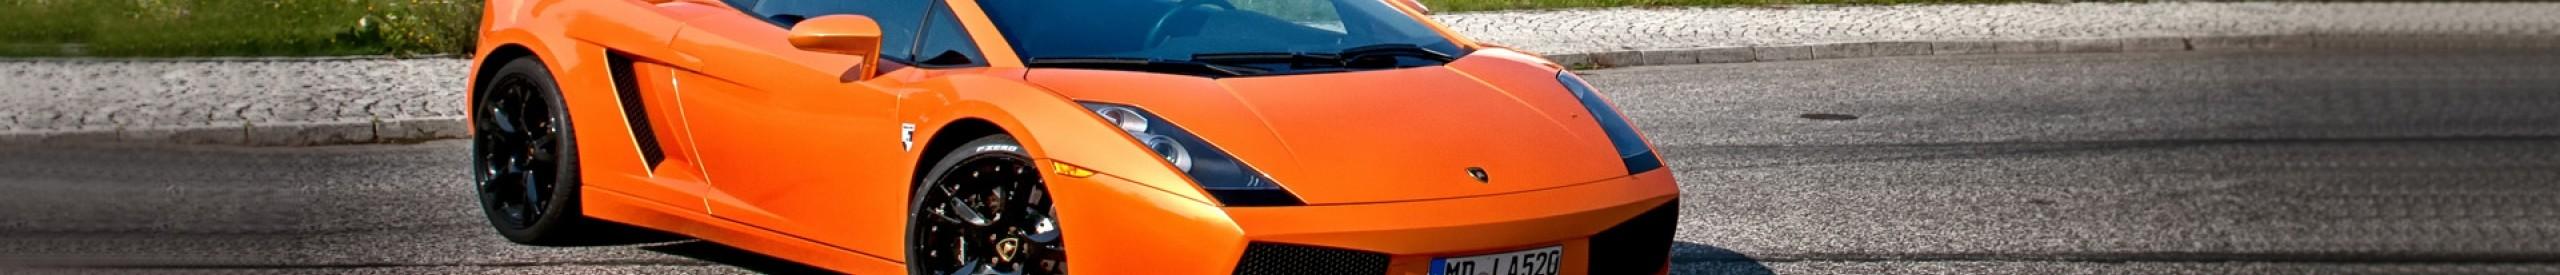 Lamborghini selber fahren